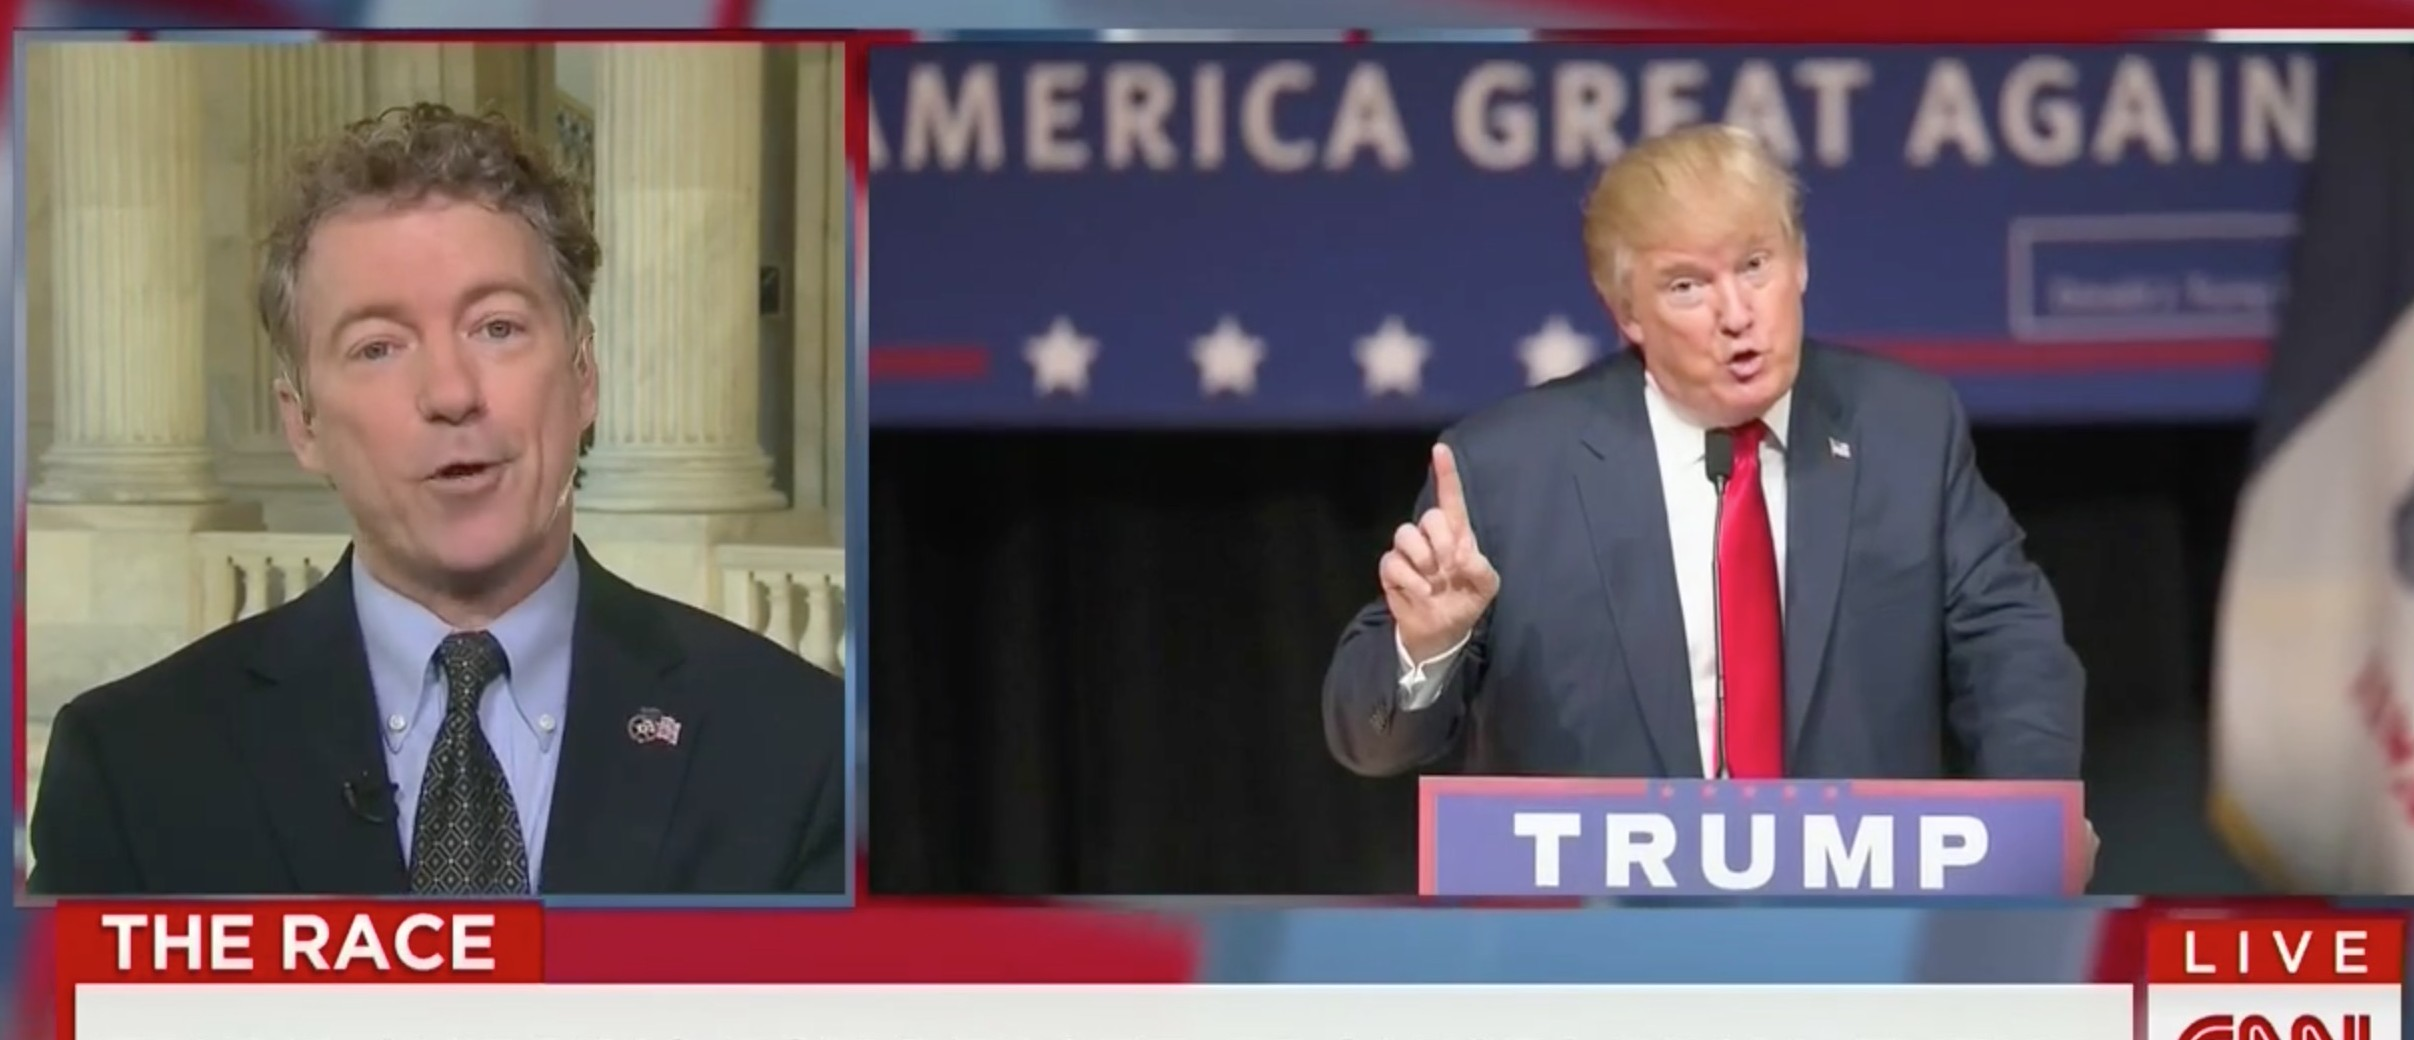 Rand Paul Blasts Trump: His Main Addition To Debate Has Been 'Silliness, Bombast, And Empty Rhetoric' [screen shot CNN]